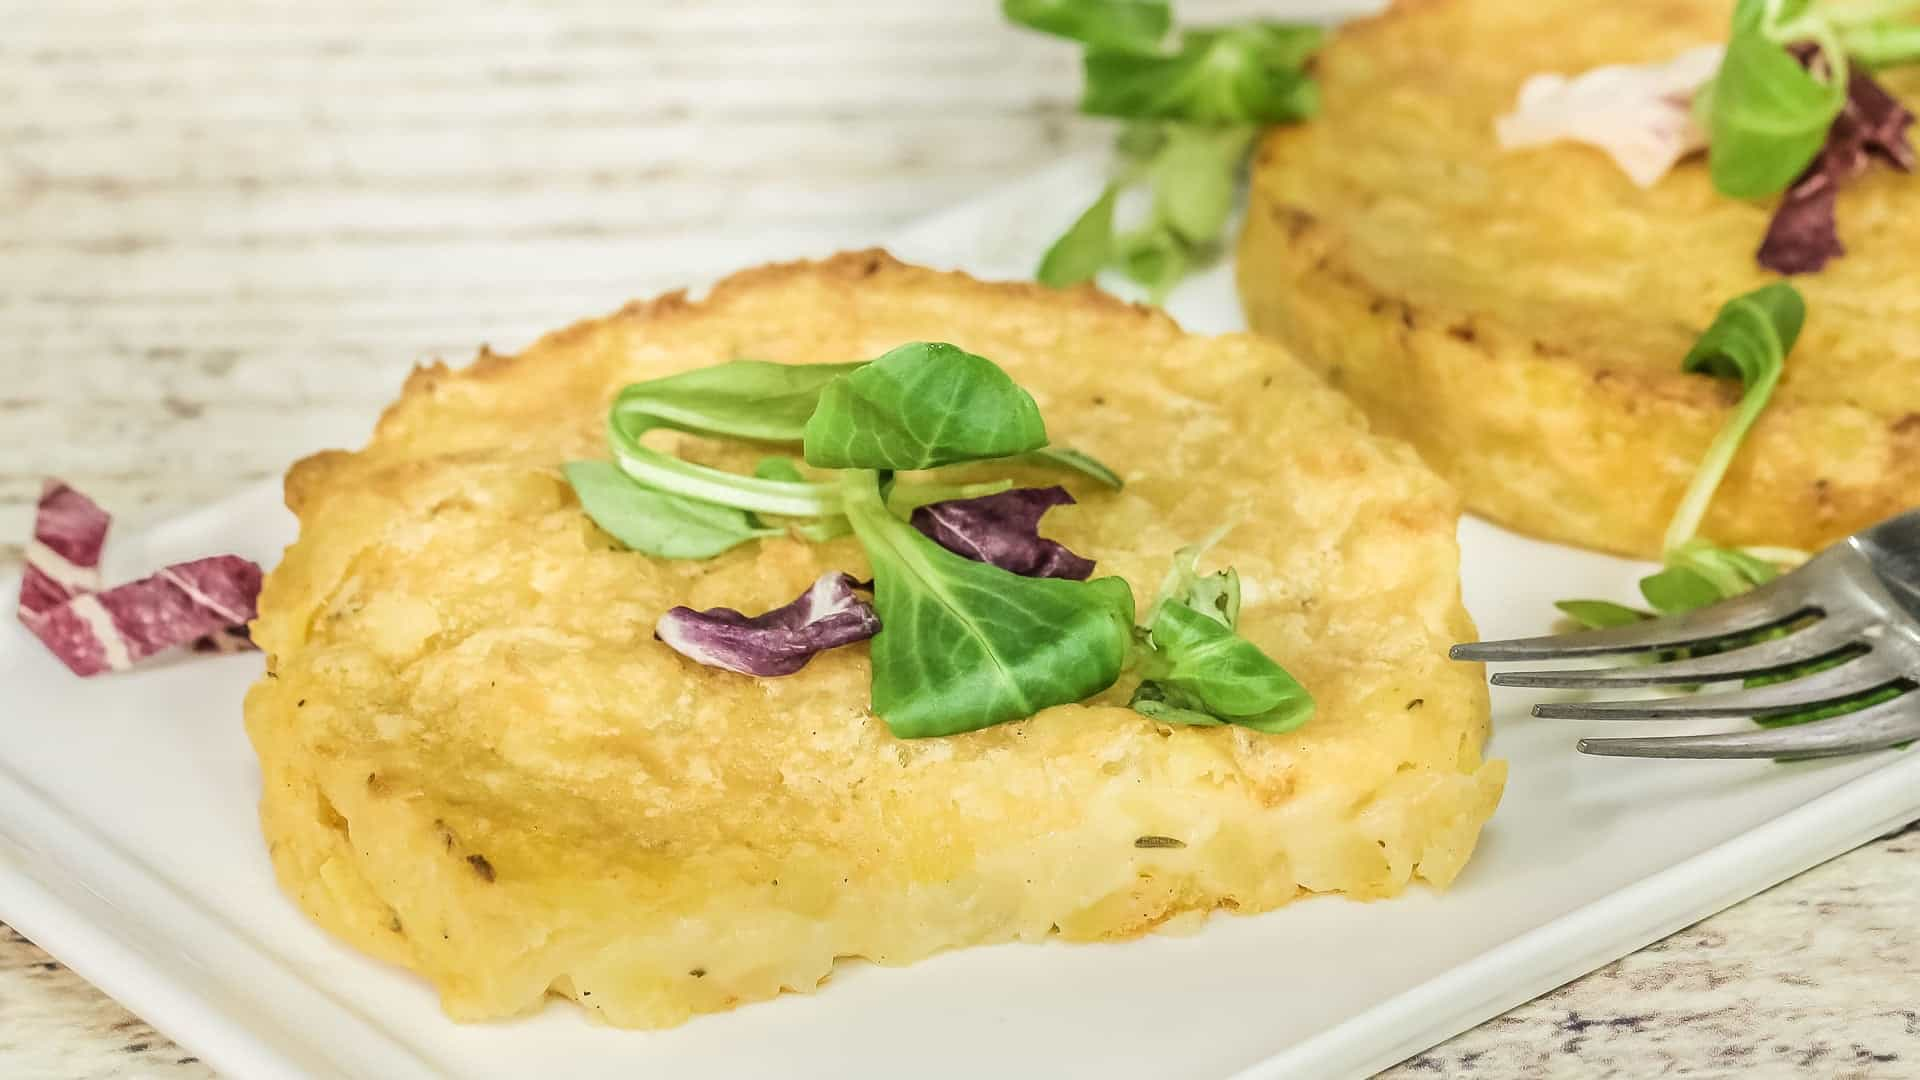 cucina sana: hamburger di patate